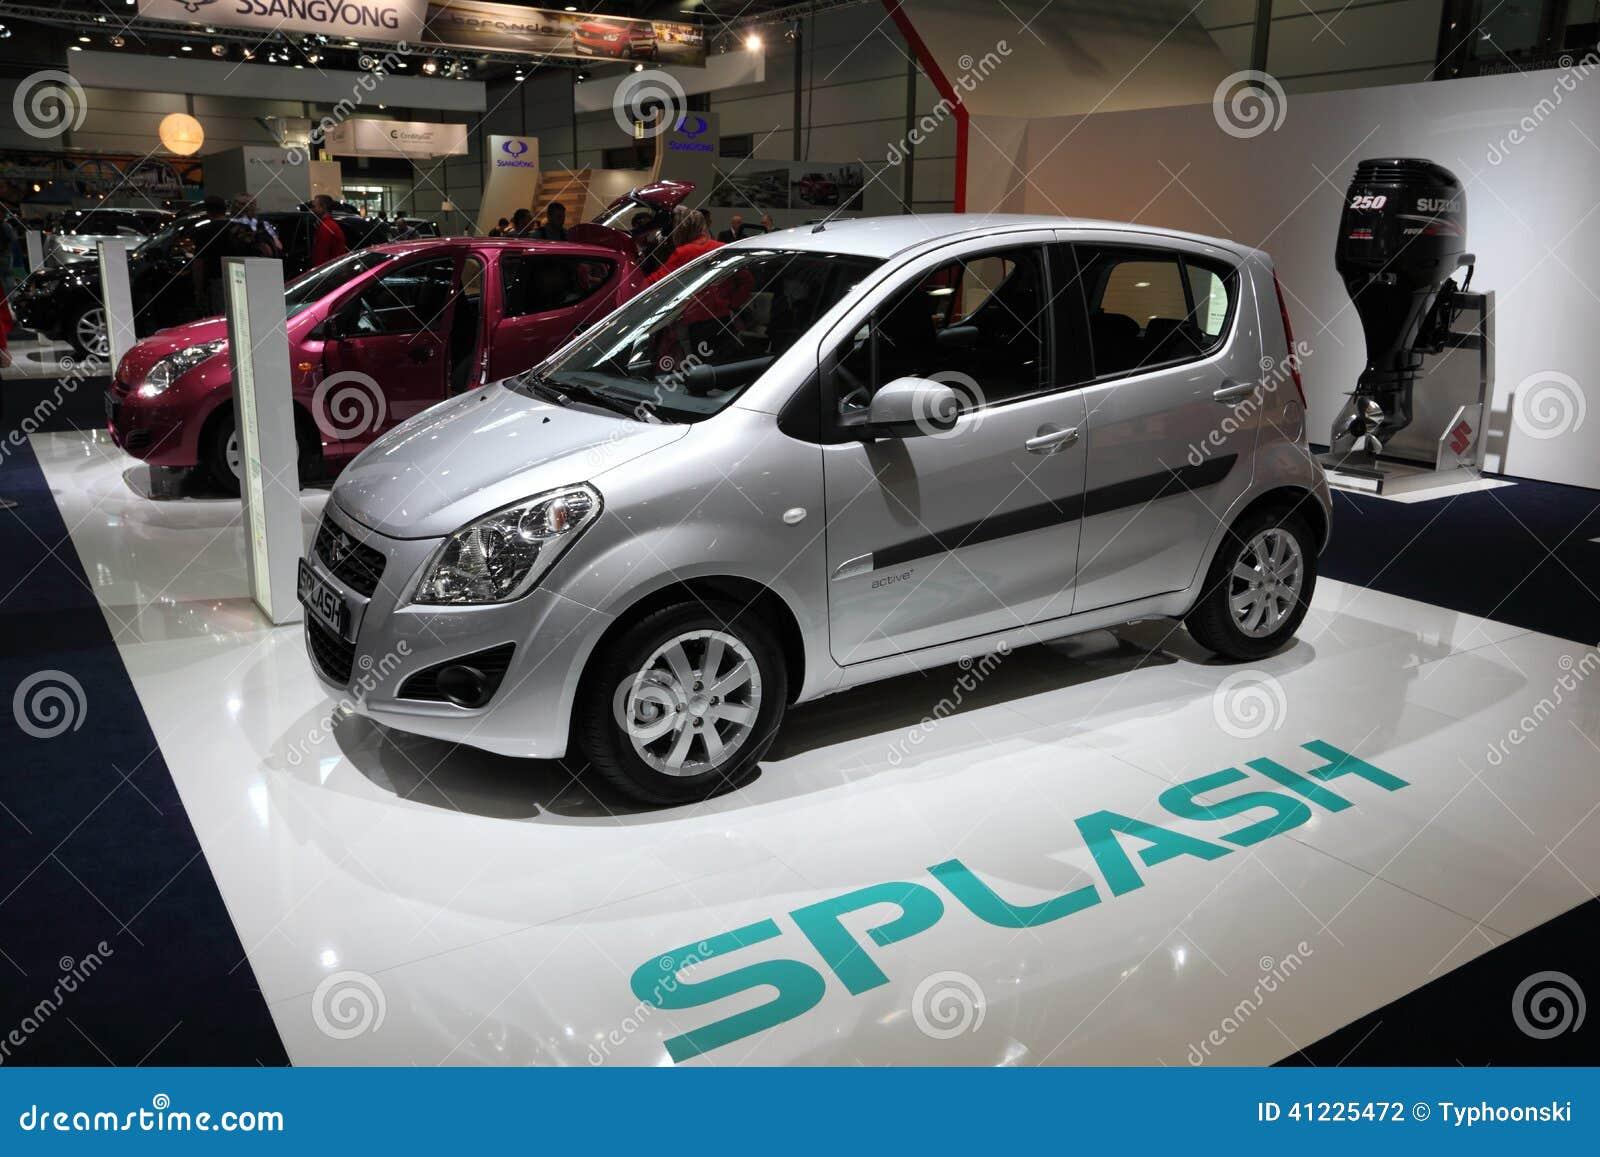 voiture de ville de suzuki splash photographie ditorial image 41225472. Black Bedroom Furniture Sets. Home Design Ideas